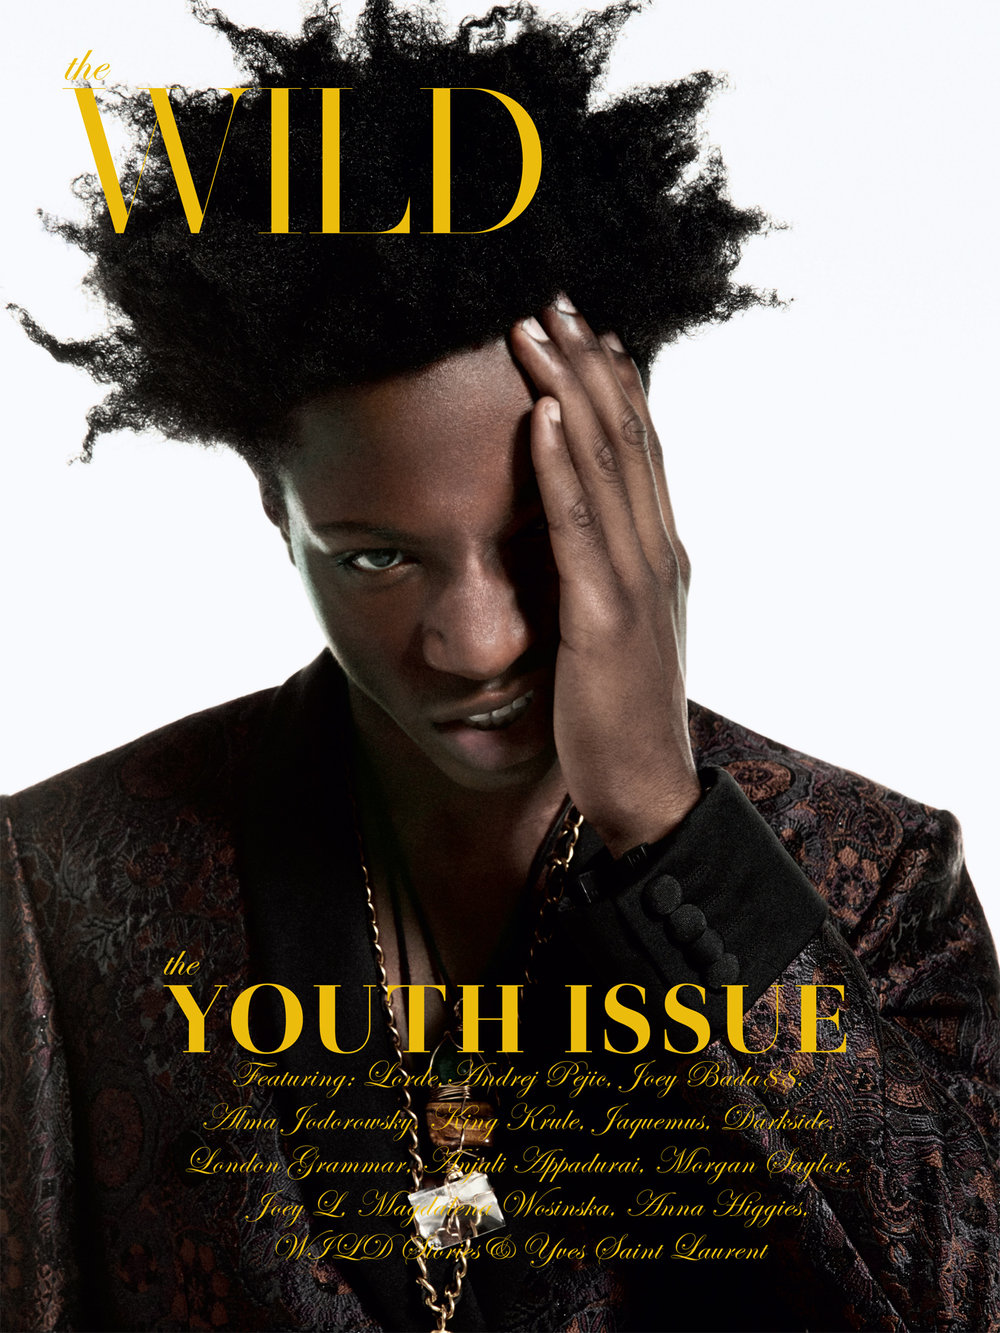 THEWILD+COVERJOEYBADA$$-1.jpg